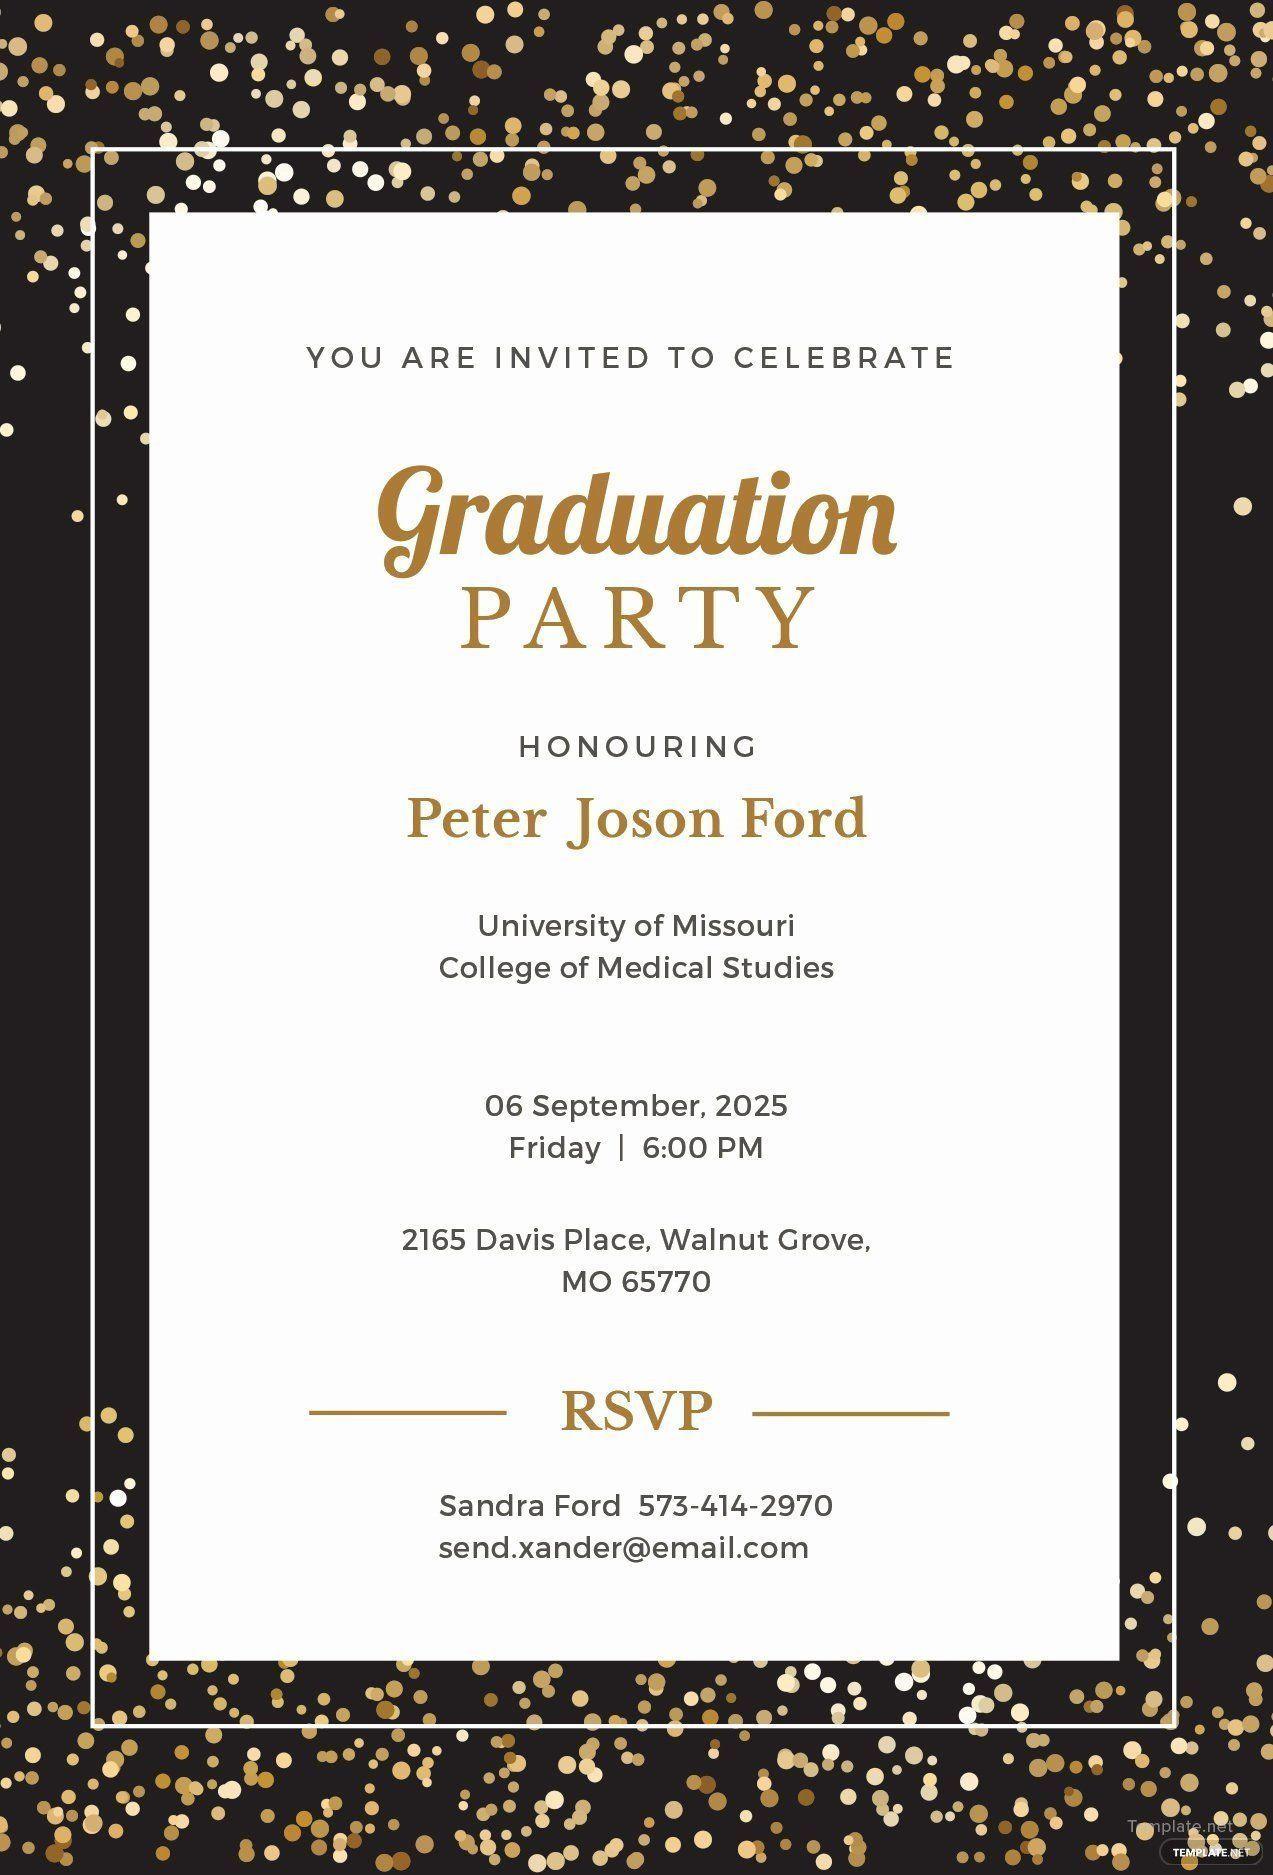 008 Sensational Microsoft Word Graduation Invitation Template Idea  PartyFull